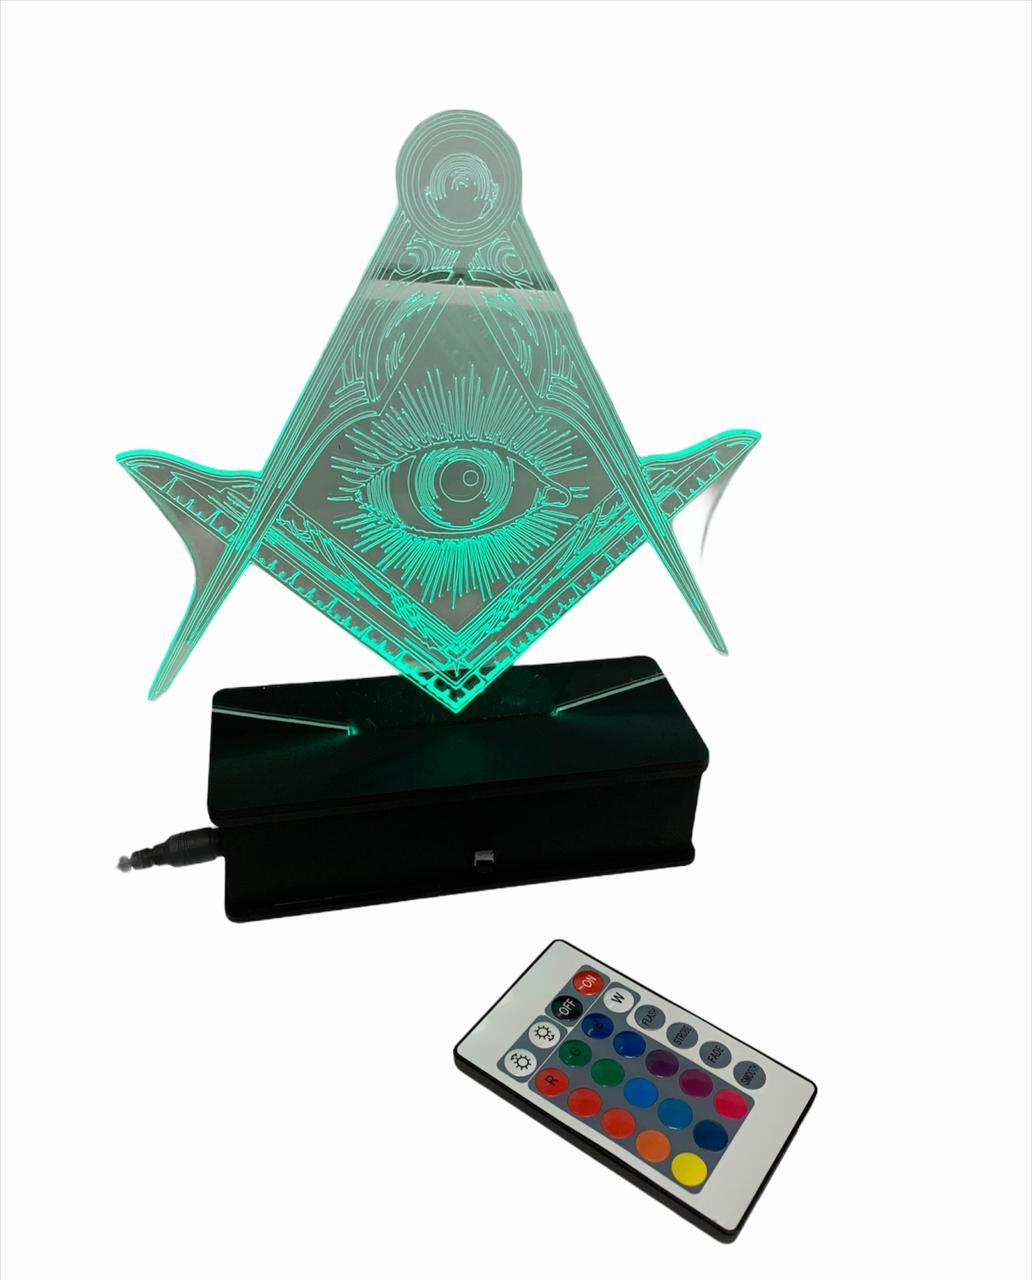 Luminária a controle remoto luz terapia - Varias intensidades de cor (escolha o modelo)